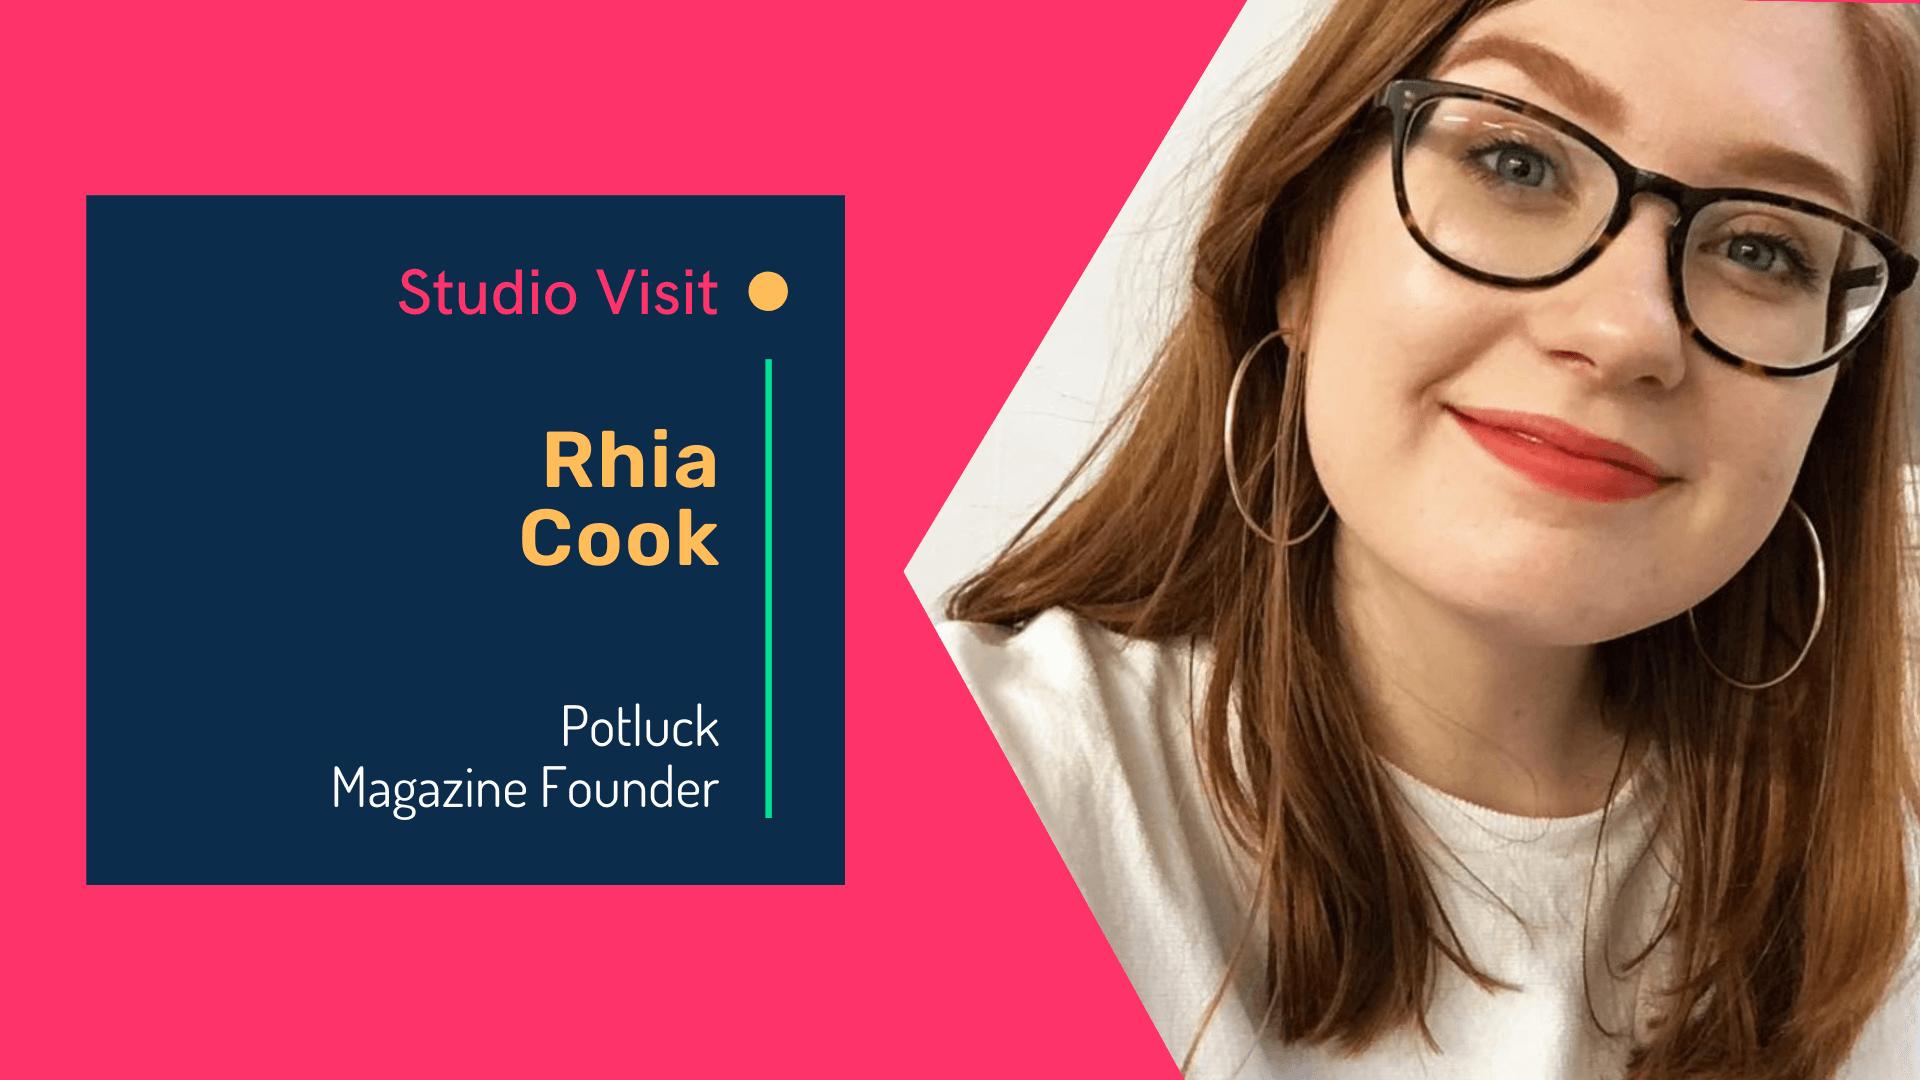 Virtual studio visit with Potluck magazine founder Rhia Cook